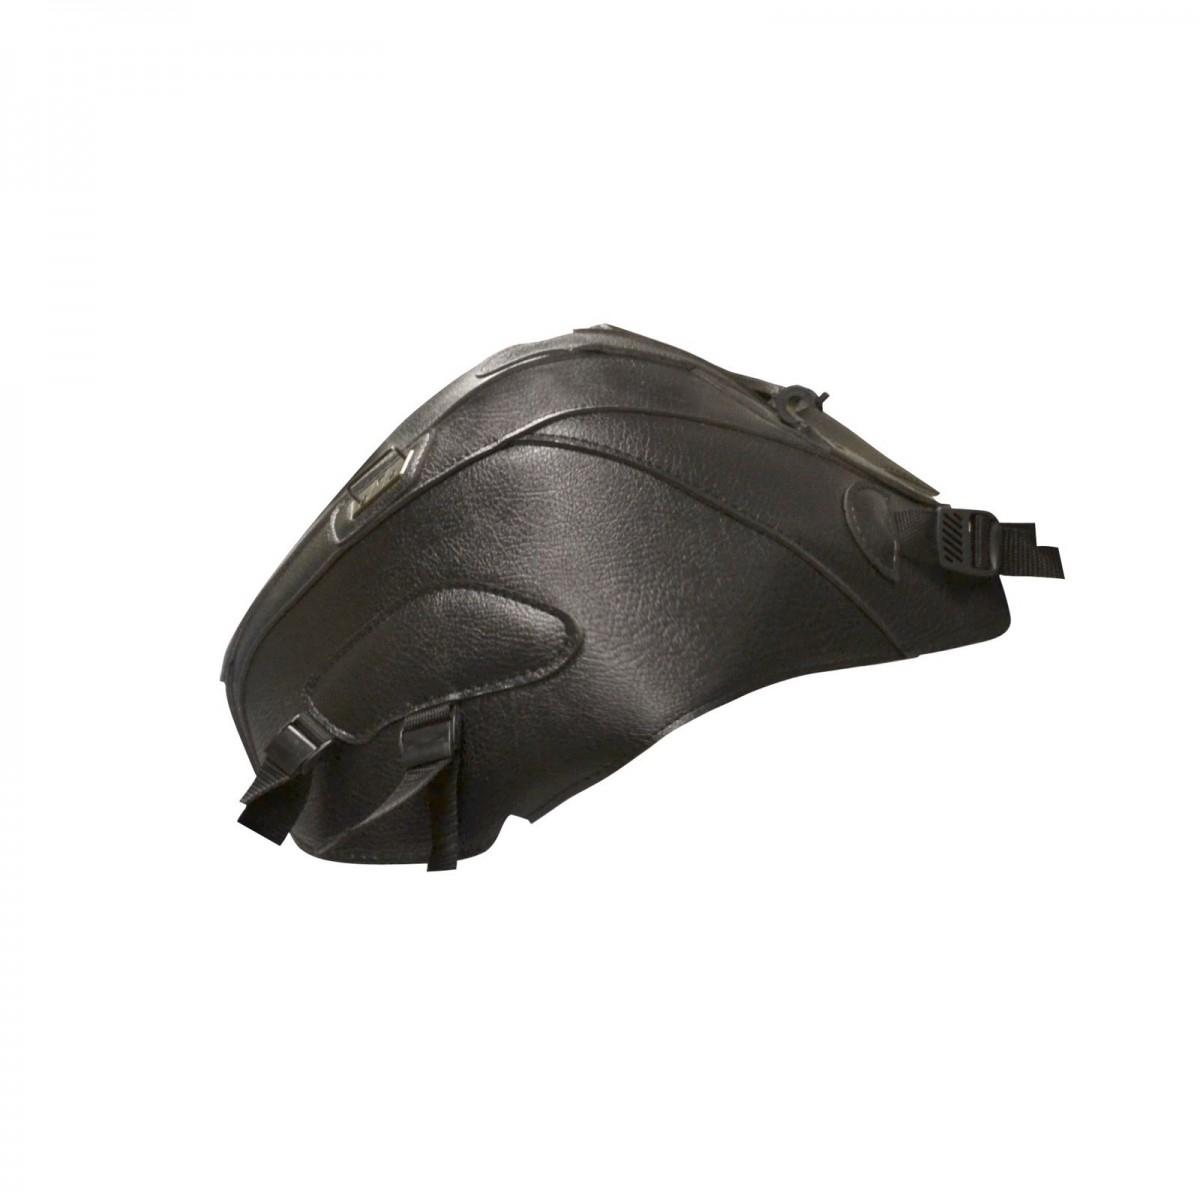 Protège-réservoir Bagster Honda CBR 125 / CBR 250 11-15 noir